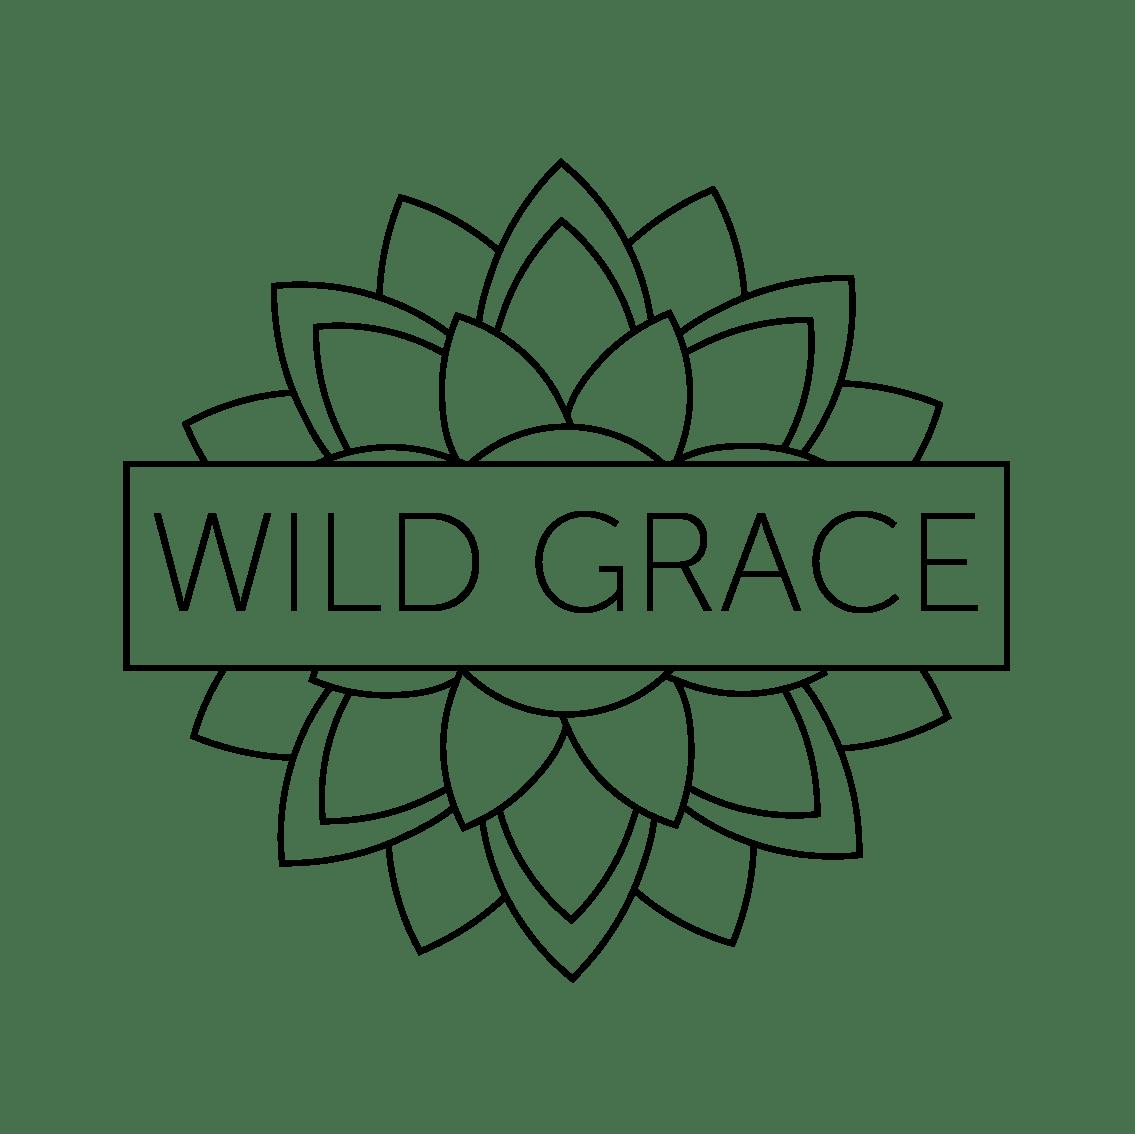 Wild Grace logo design